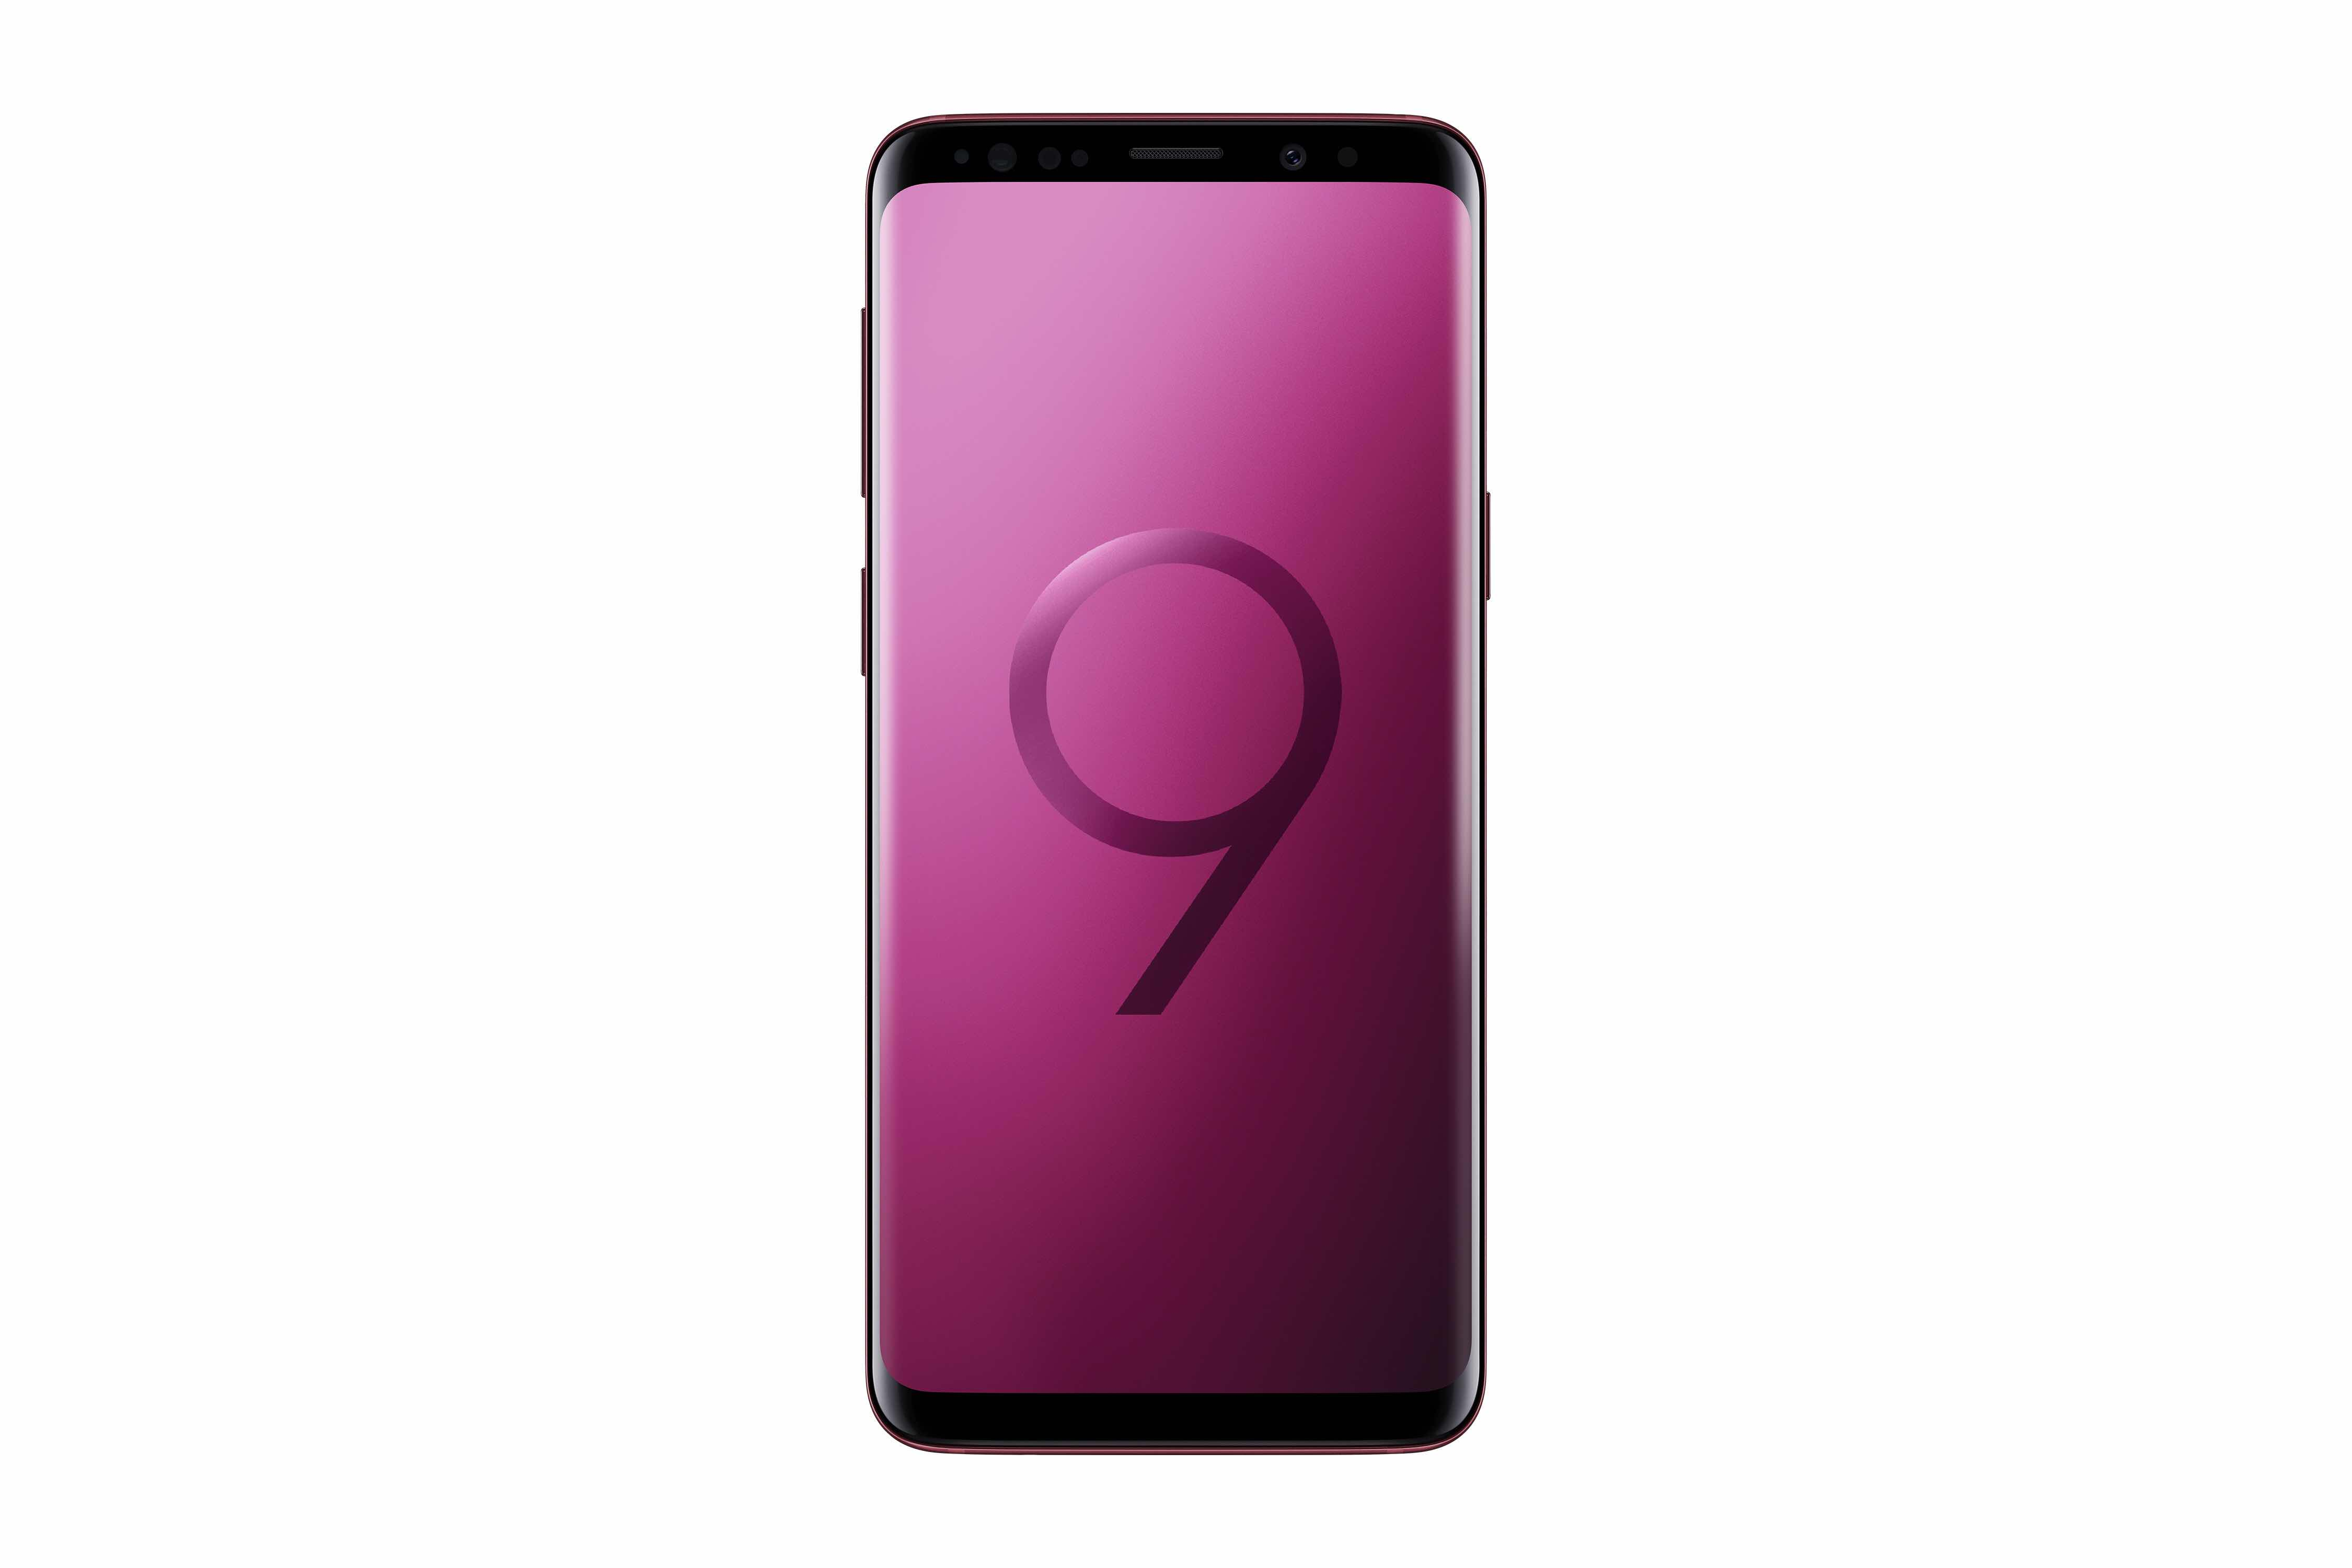 Galaxy S9 Plus Burgundy Red 4